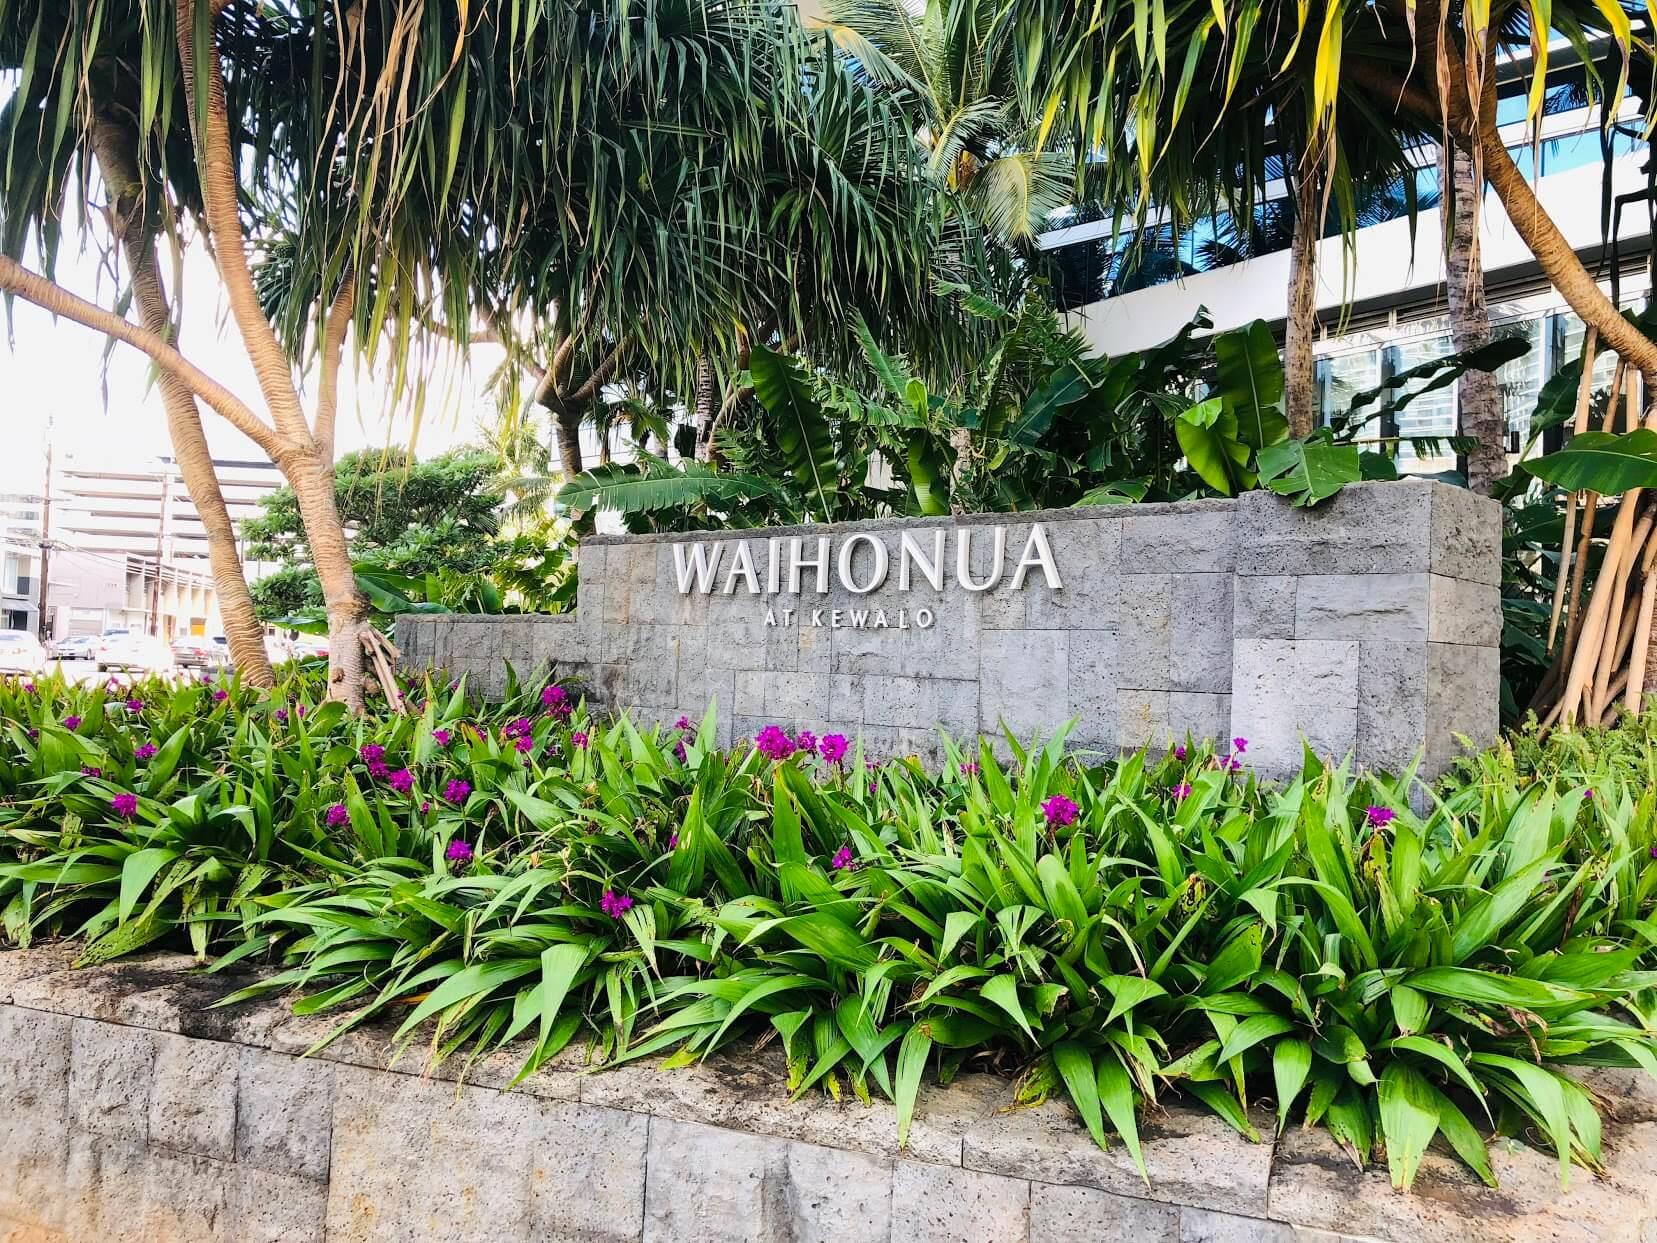 Waihonua at Kewaloの看板